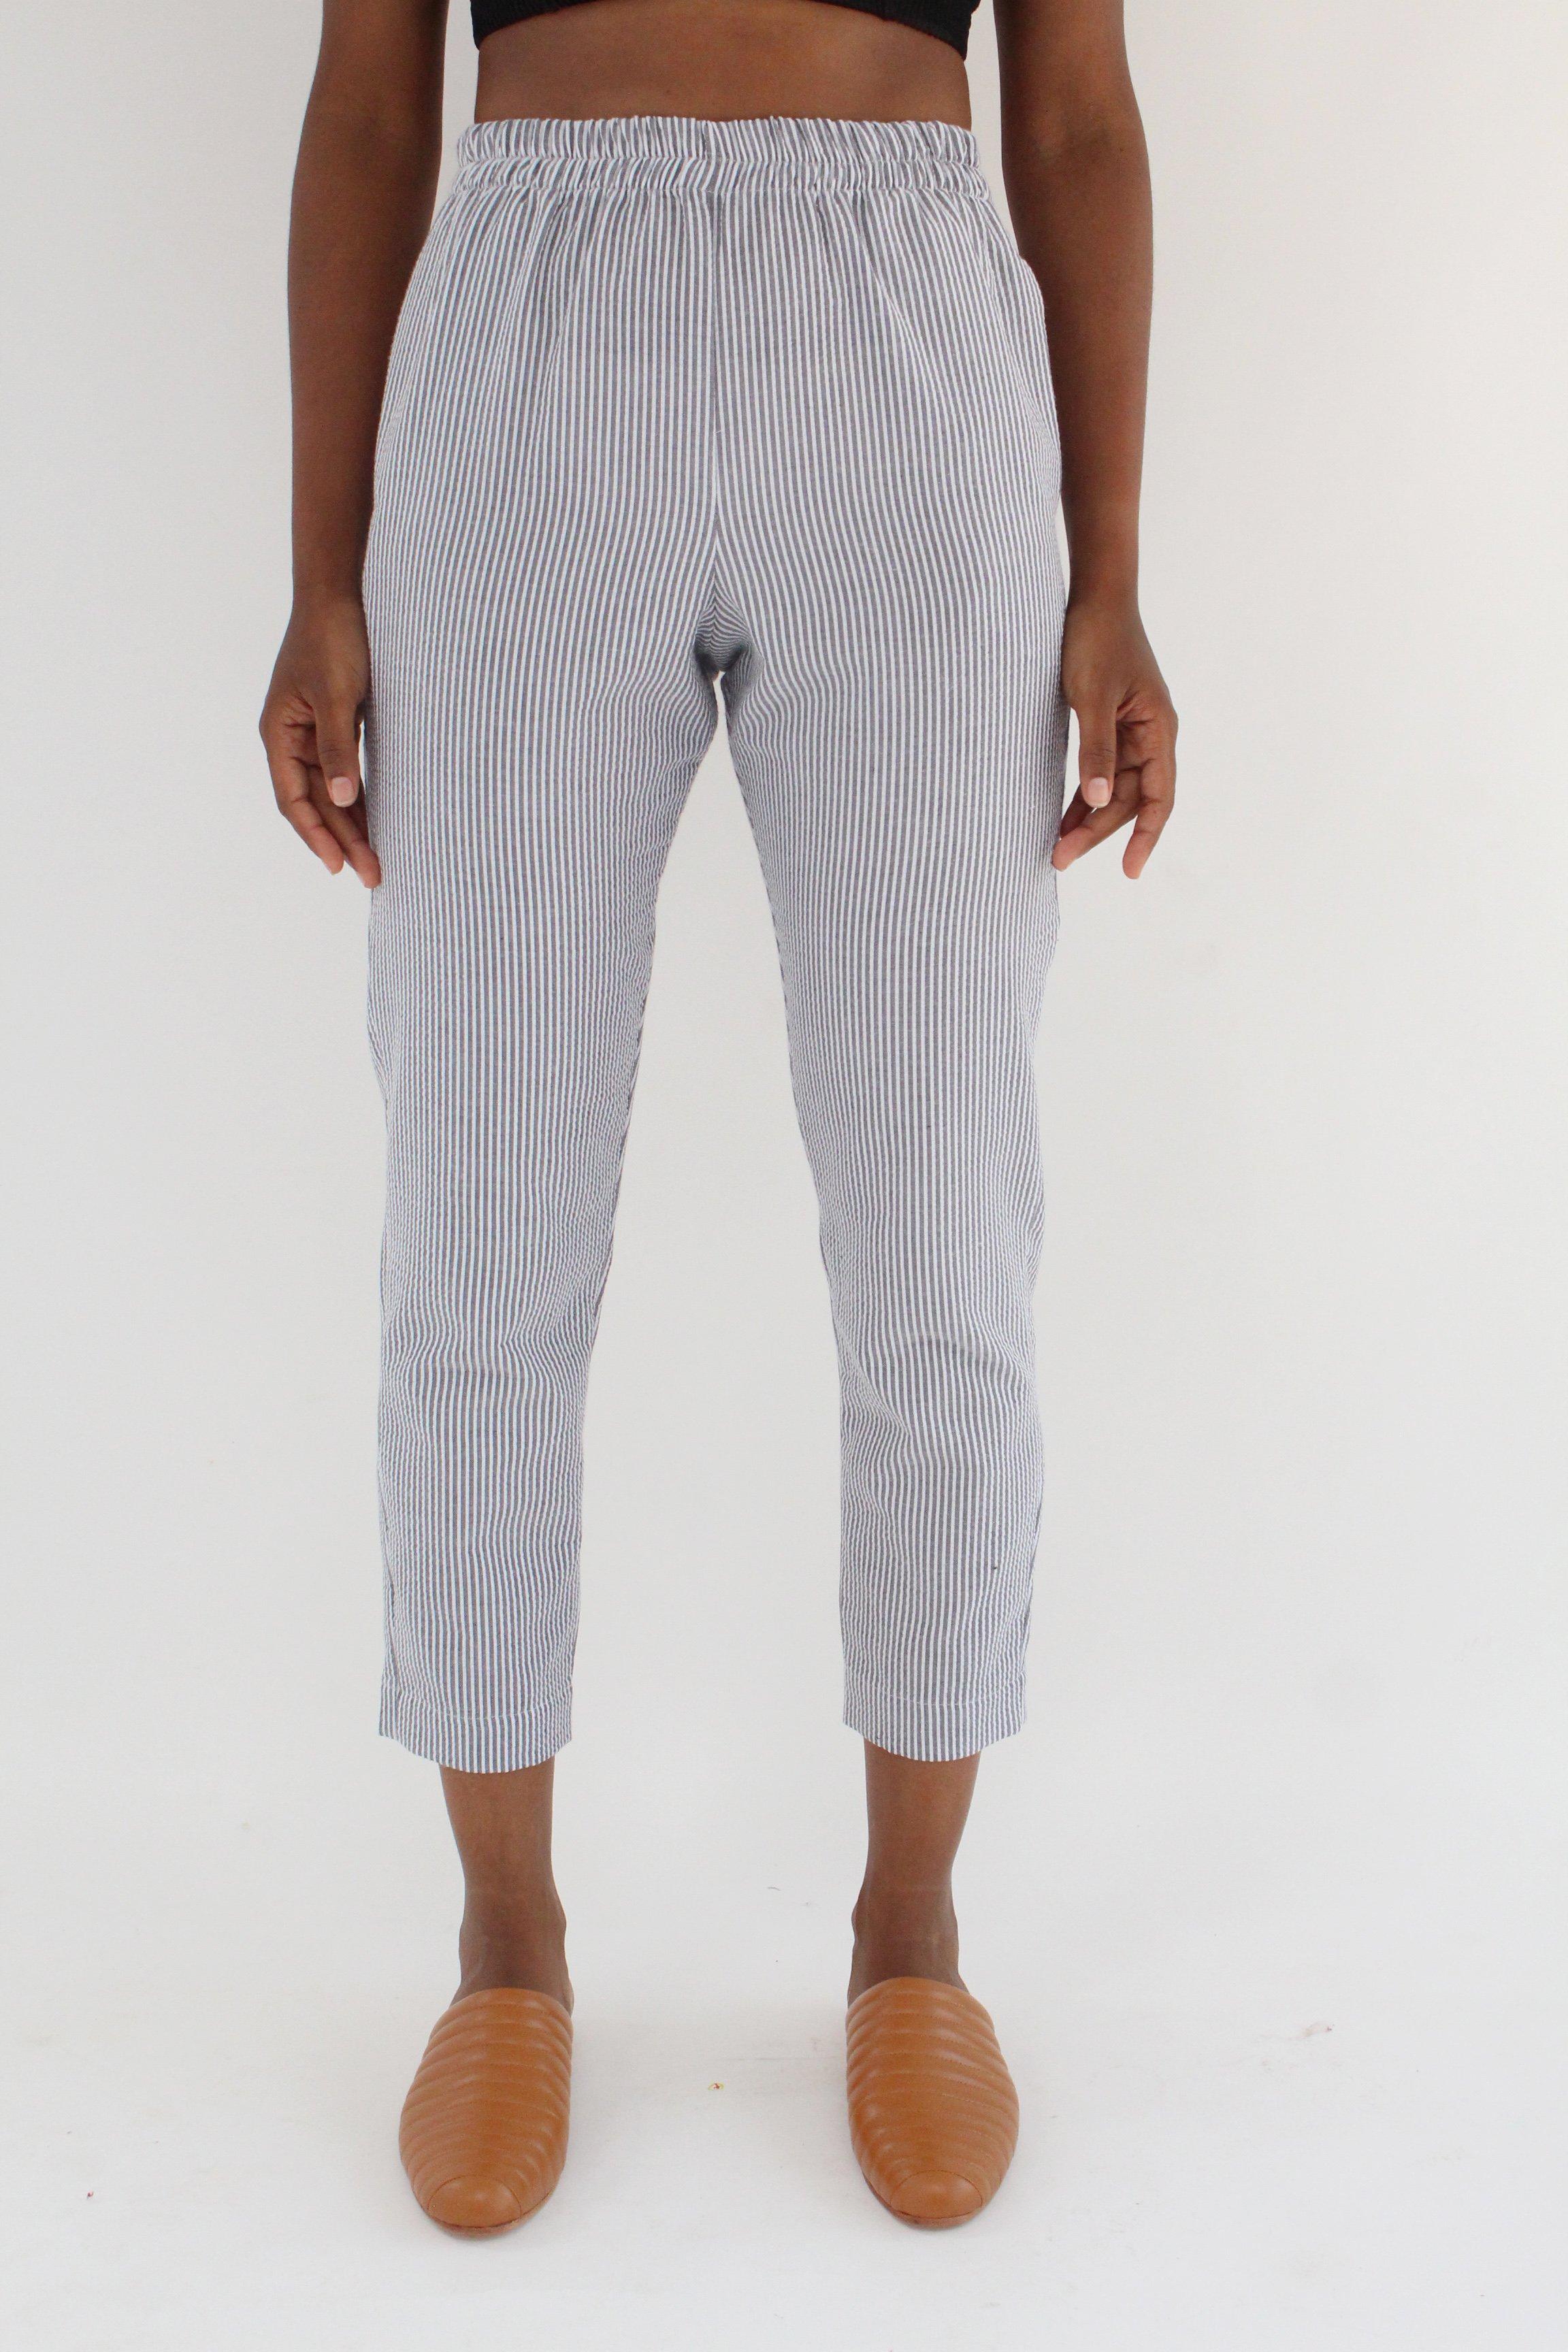 Beklina Basic Seersucker Pant Charcoal Garmentory